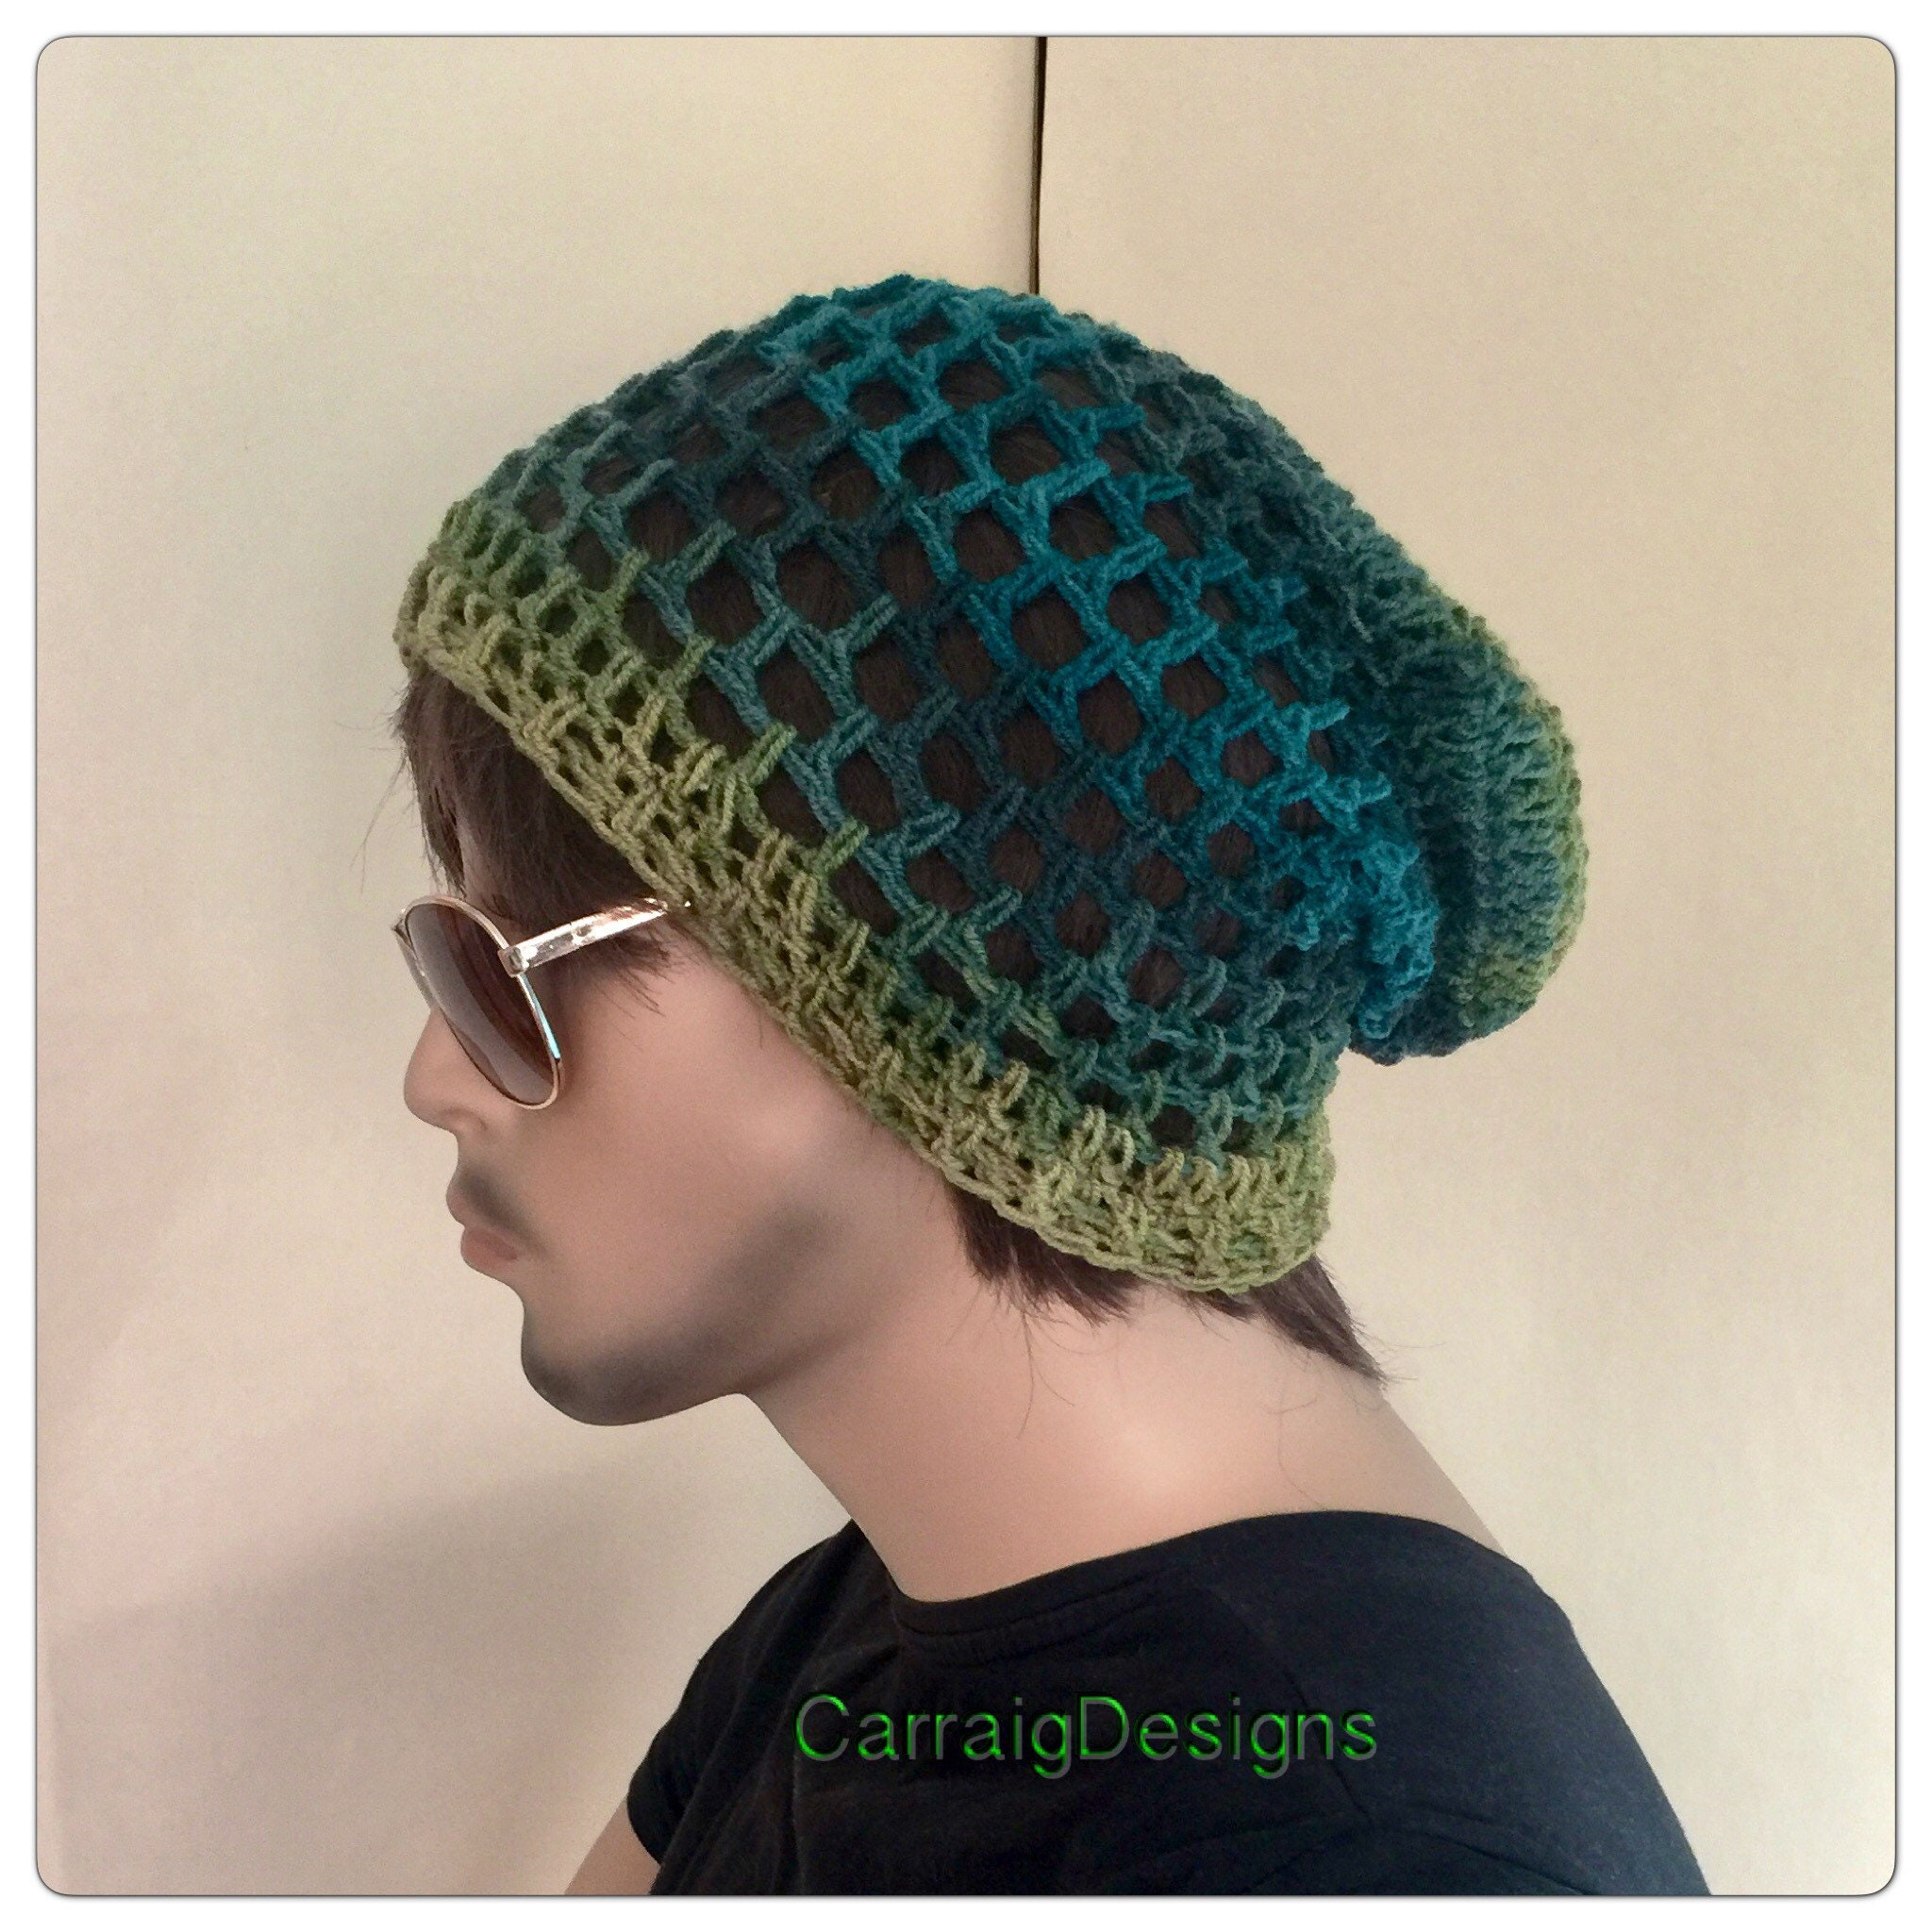 5930c2a8677 Mesh beanie hat mans men unisex hand crocheted knit oversized slouch beanie  dread tam hat green hippie boho xmas gift irish sale airy irish